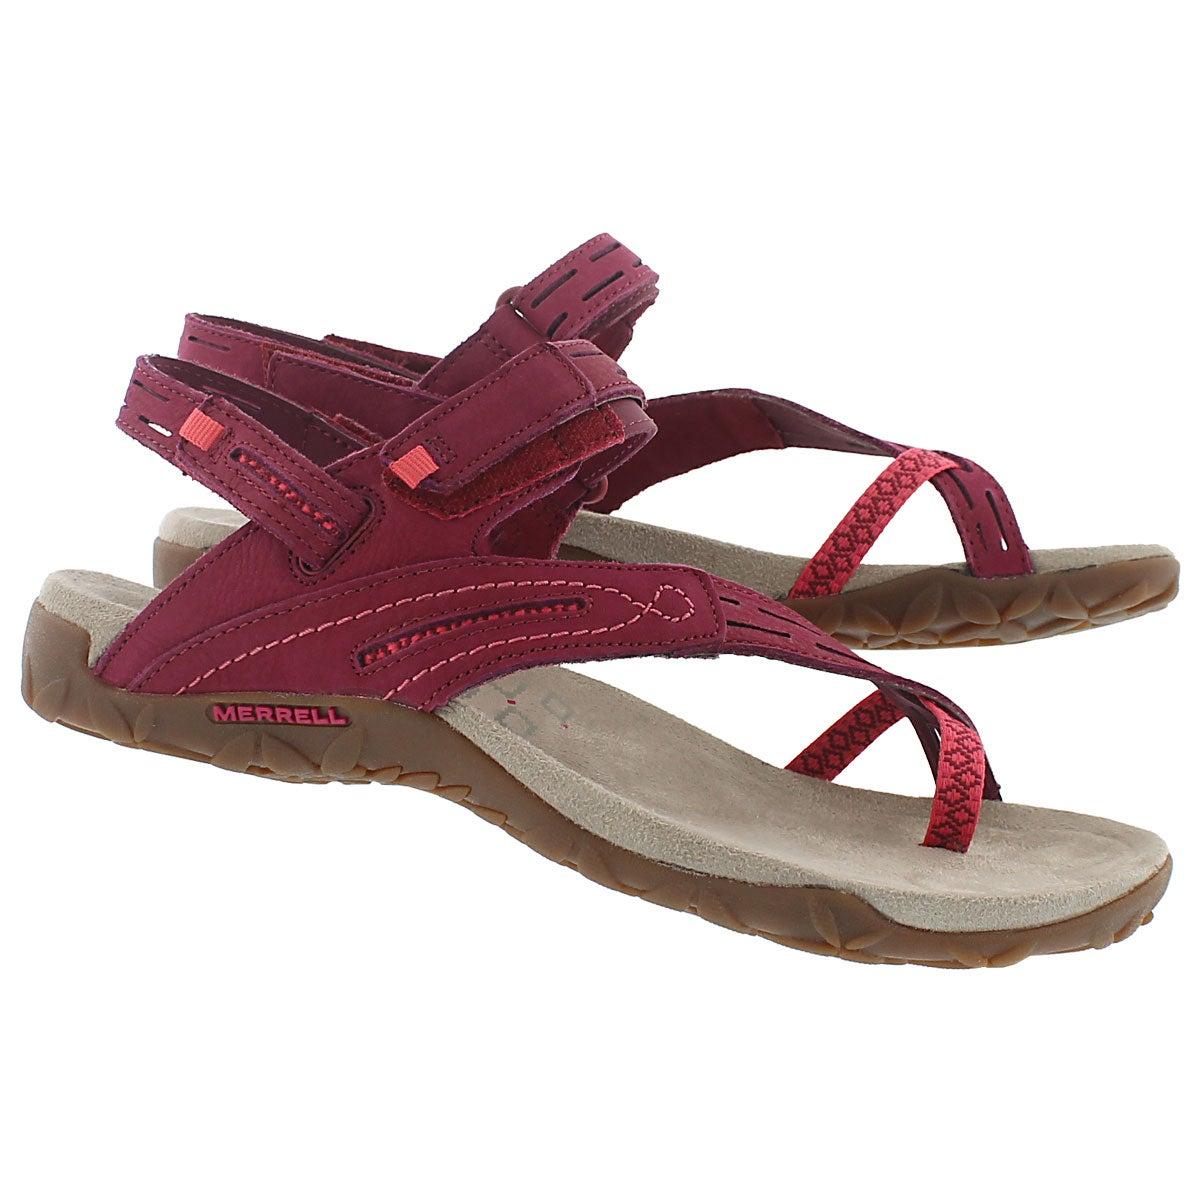 Lds Terran Convertible II fuchsia sandal